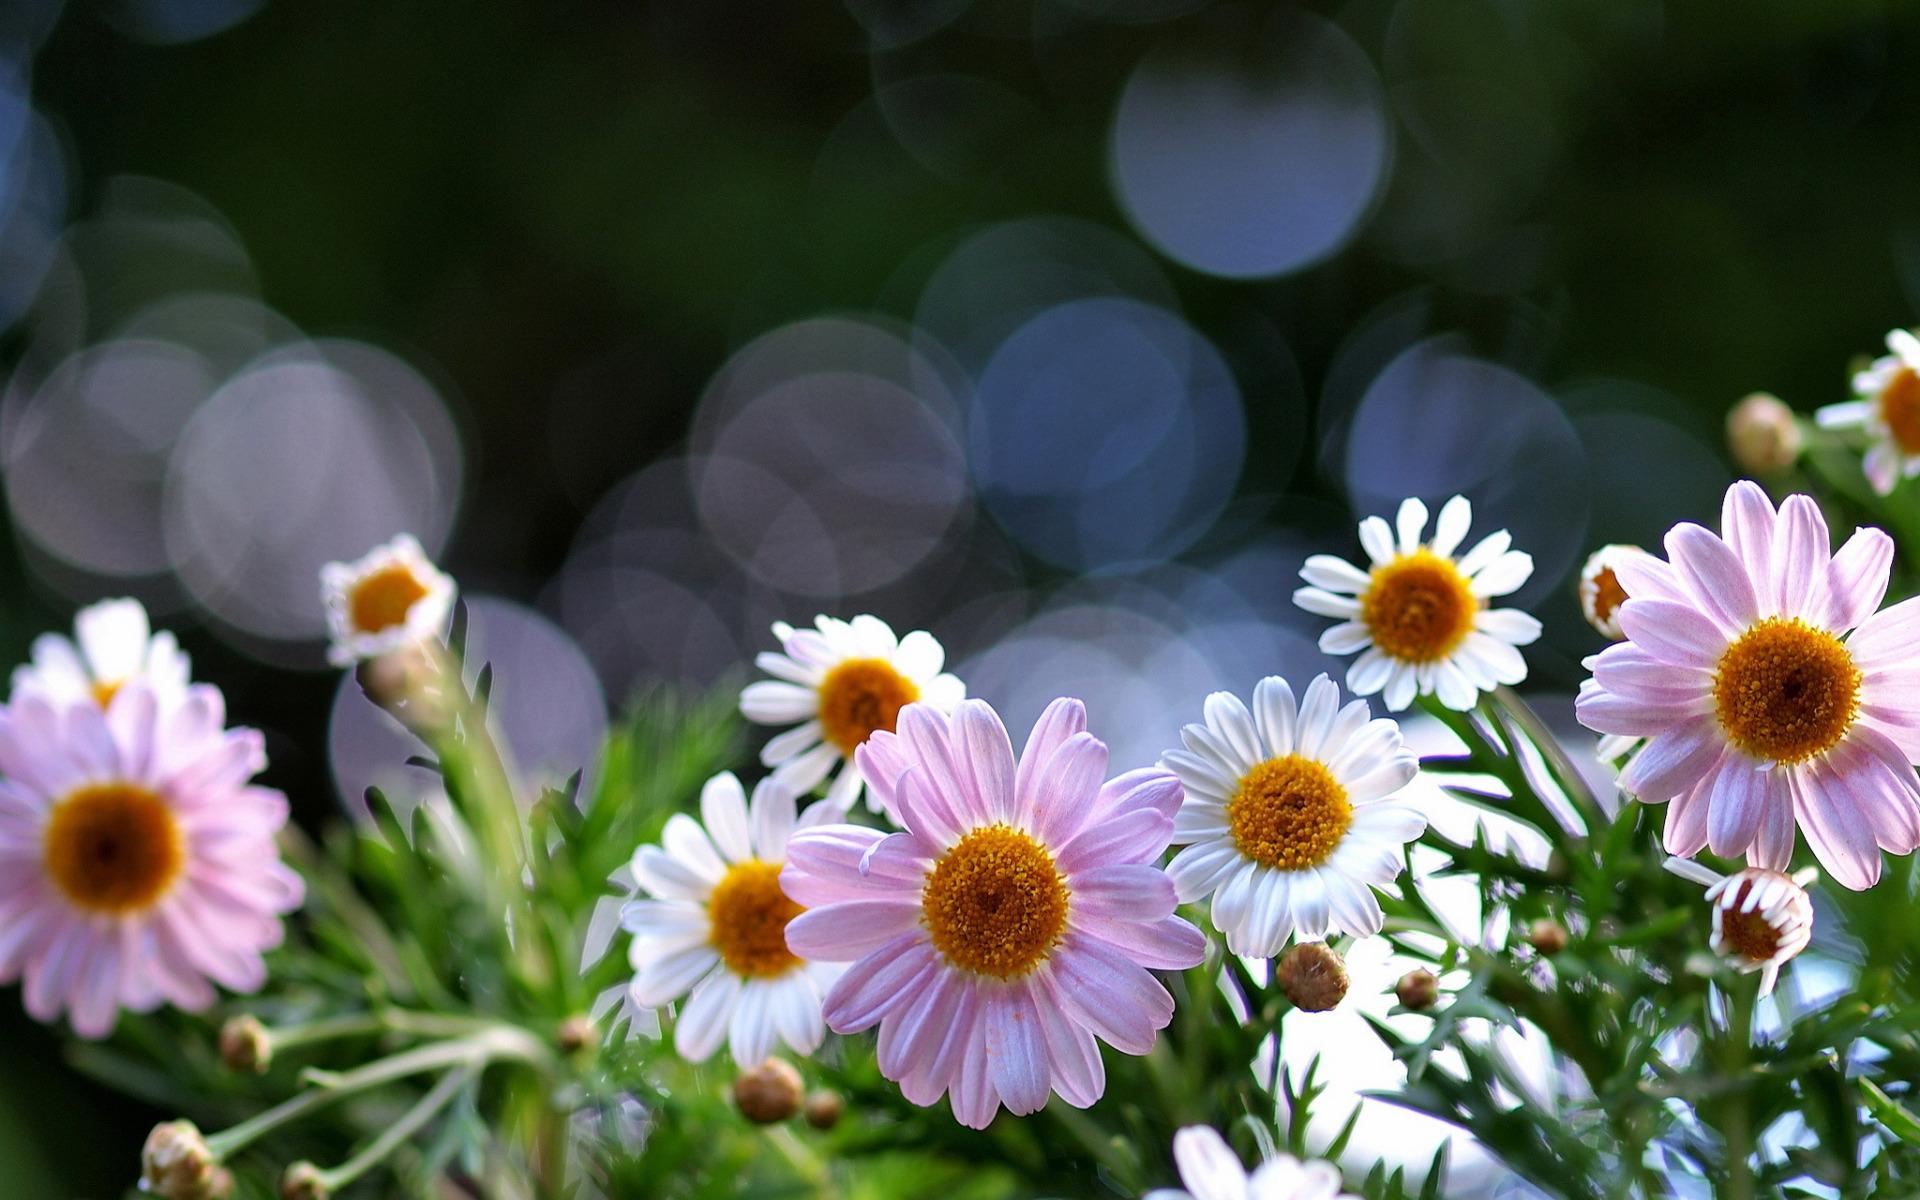 ромашки розовые белые chamomile pink white  № 1038004 бесплатно